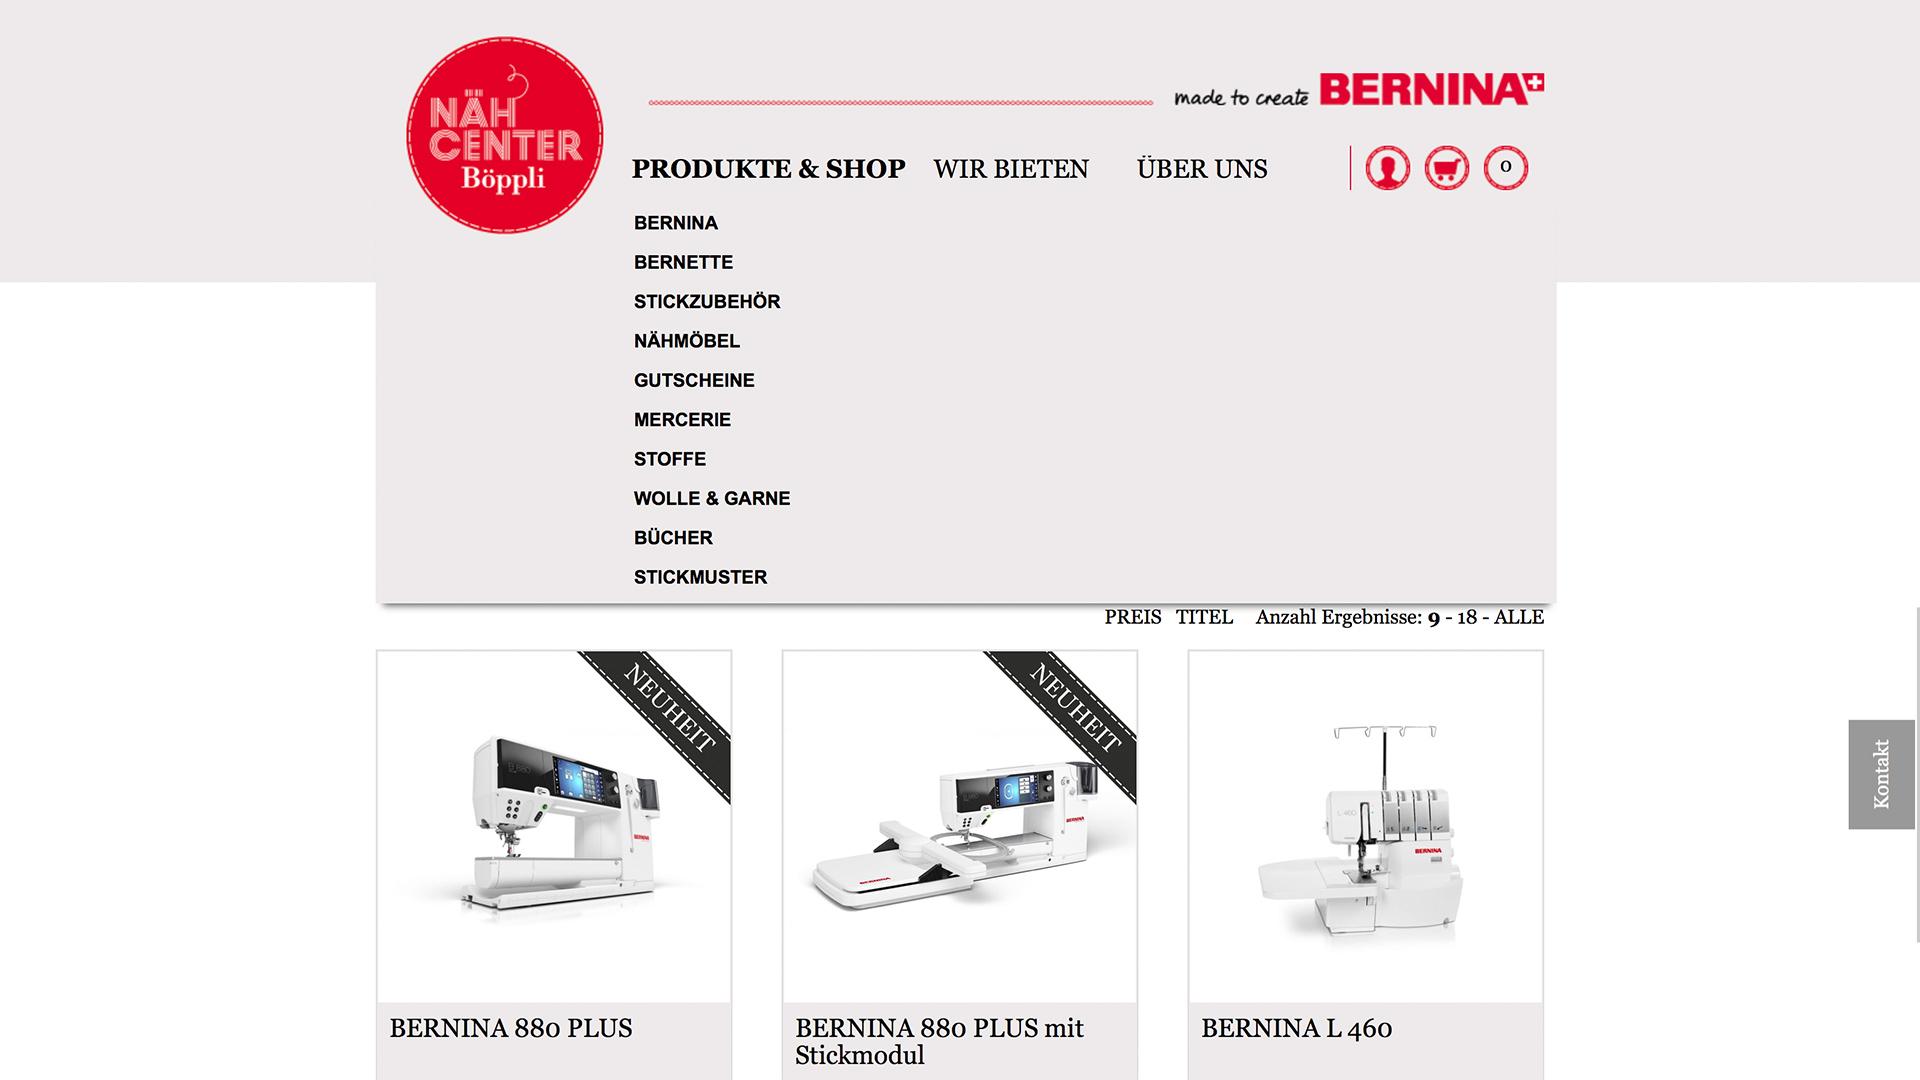 Bild 2 vom Böppli Nähcenter Online-Shop